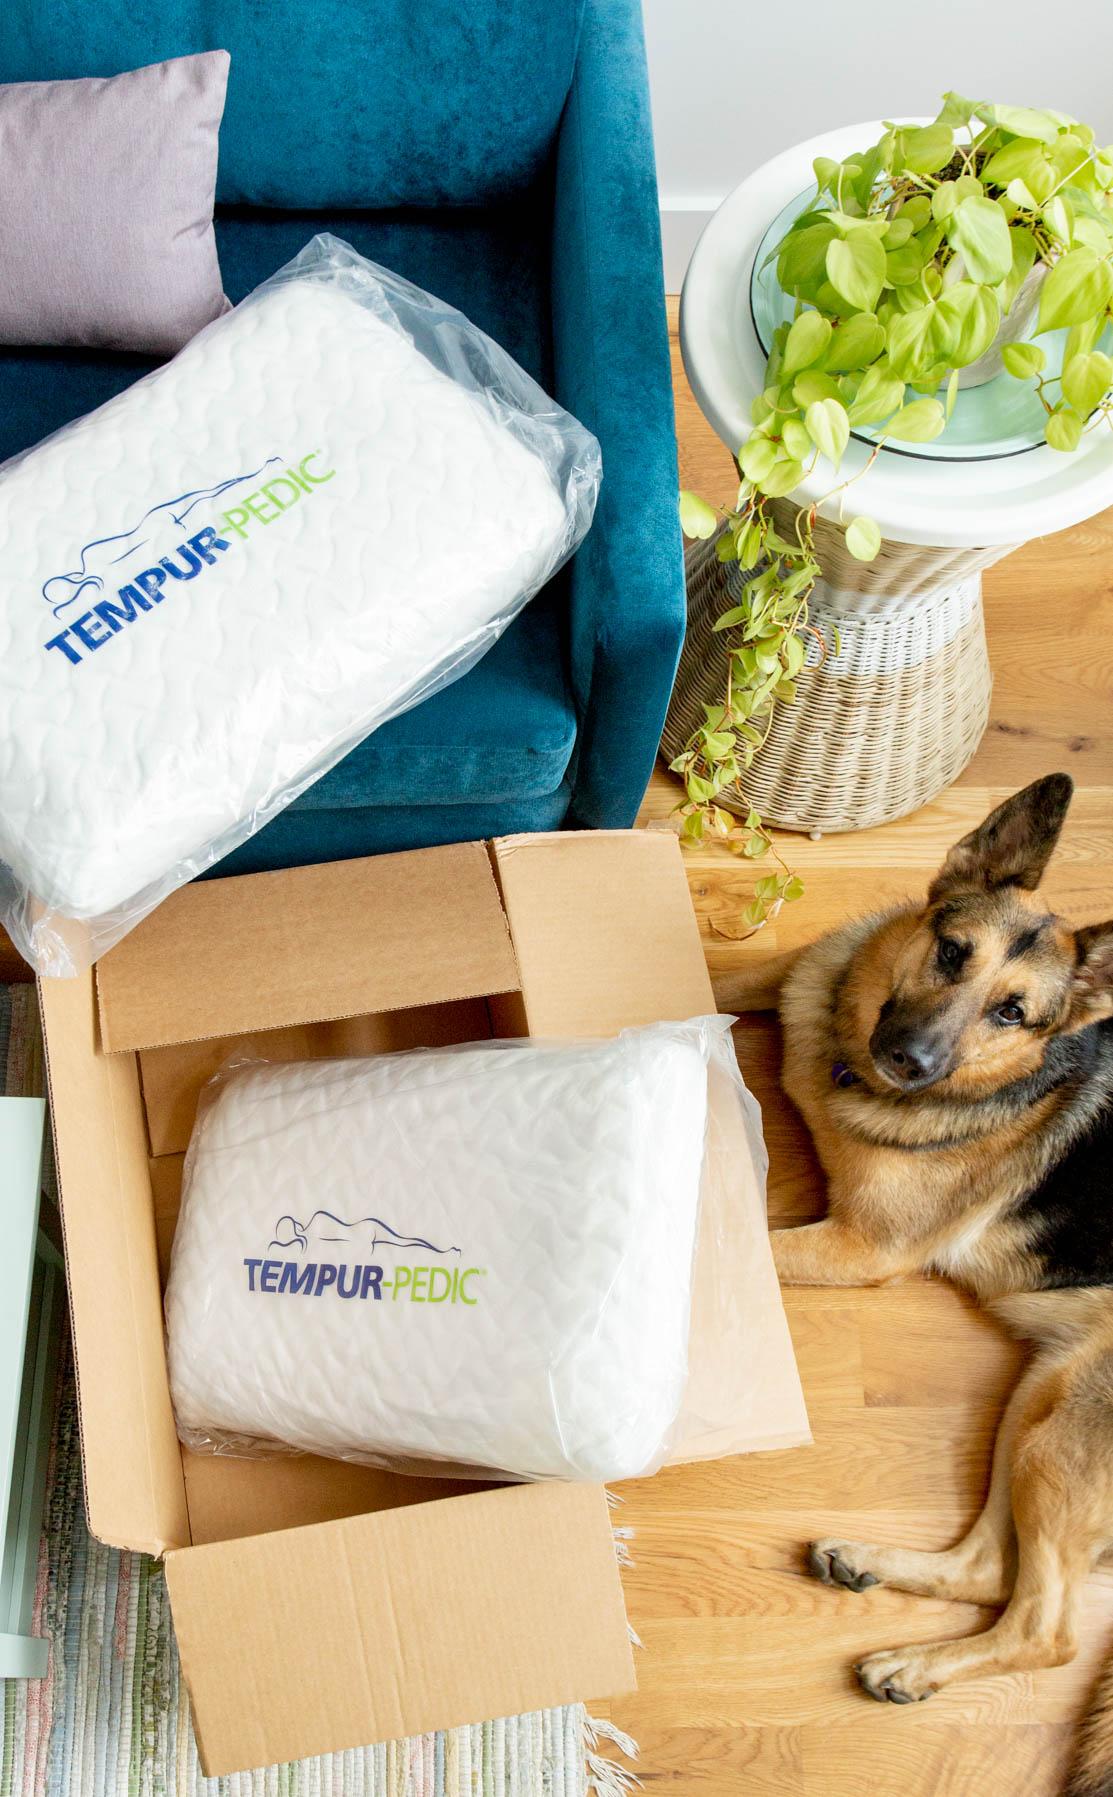 tempur-pedic-pillow-campaign-1.jpg